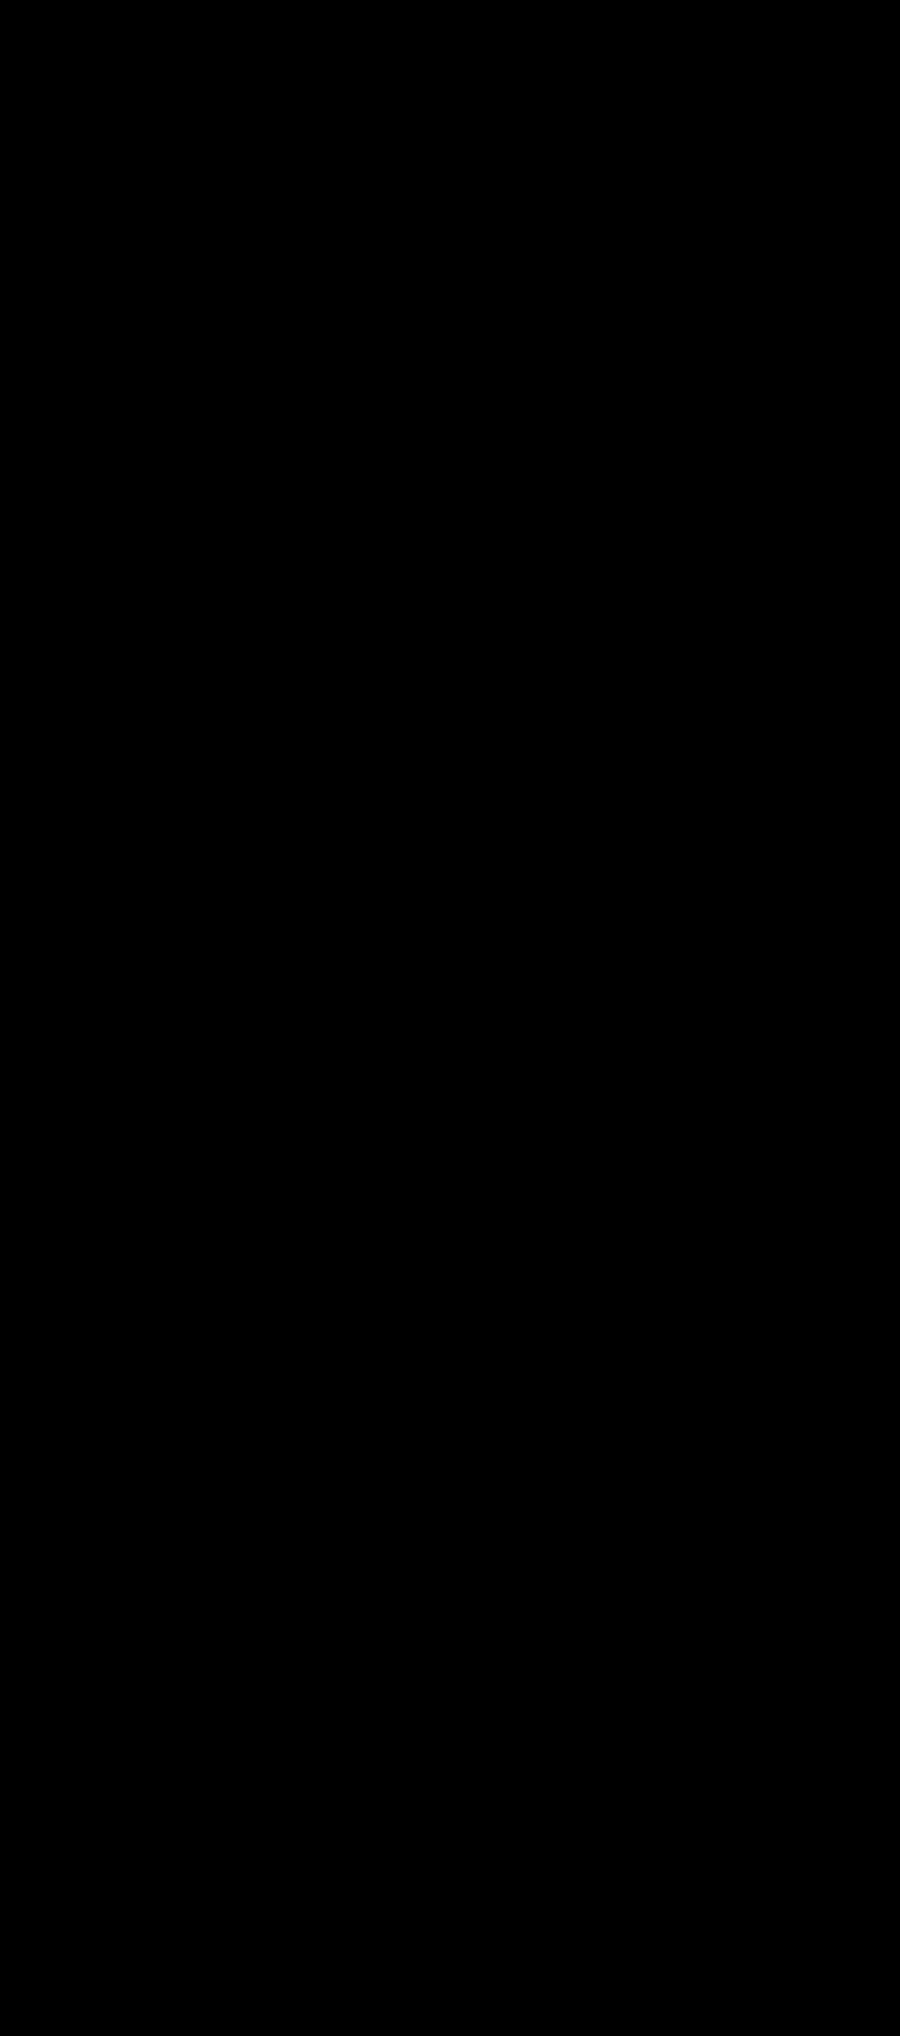 Kirito Lineart : Spriggan kirito lineart by shikauninspired on deviantart